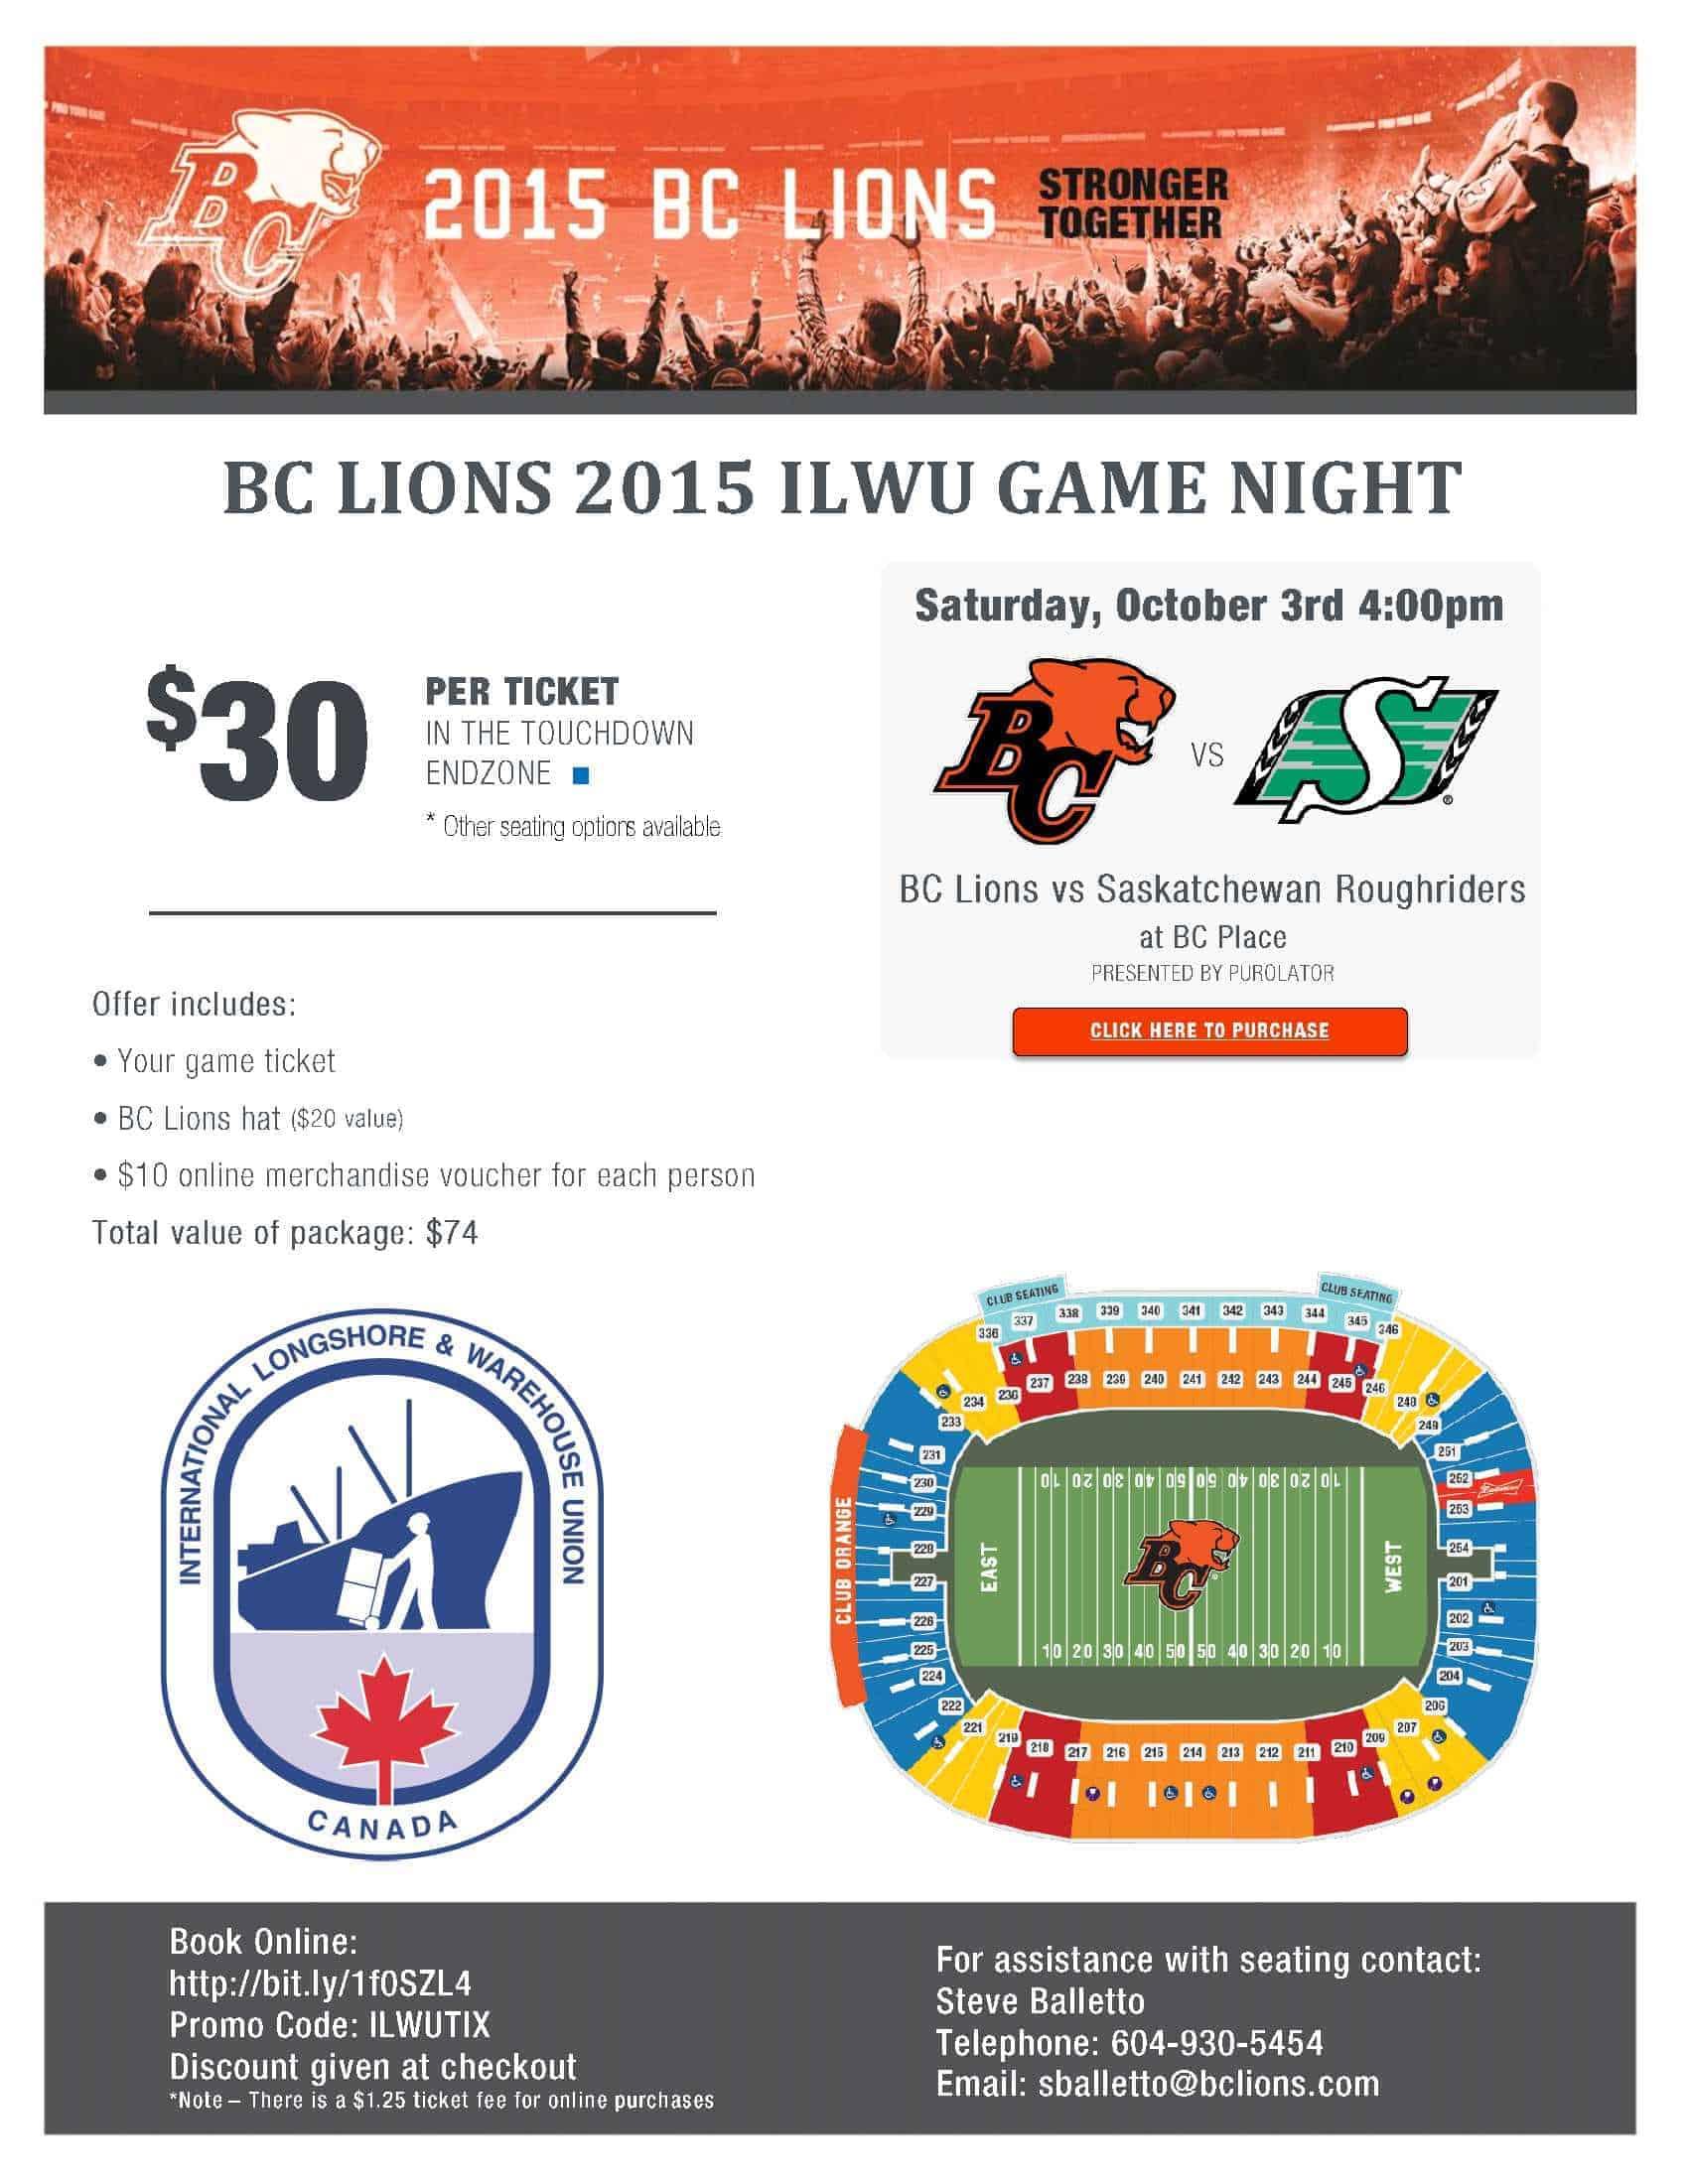 ILWU Game Night Poster